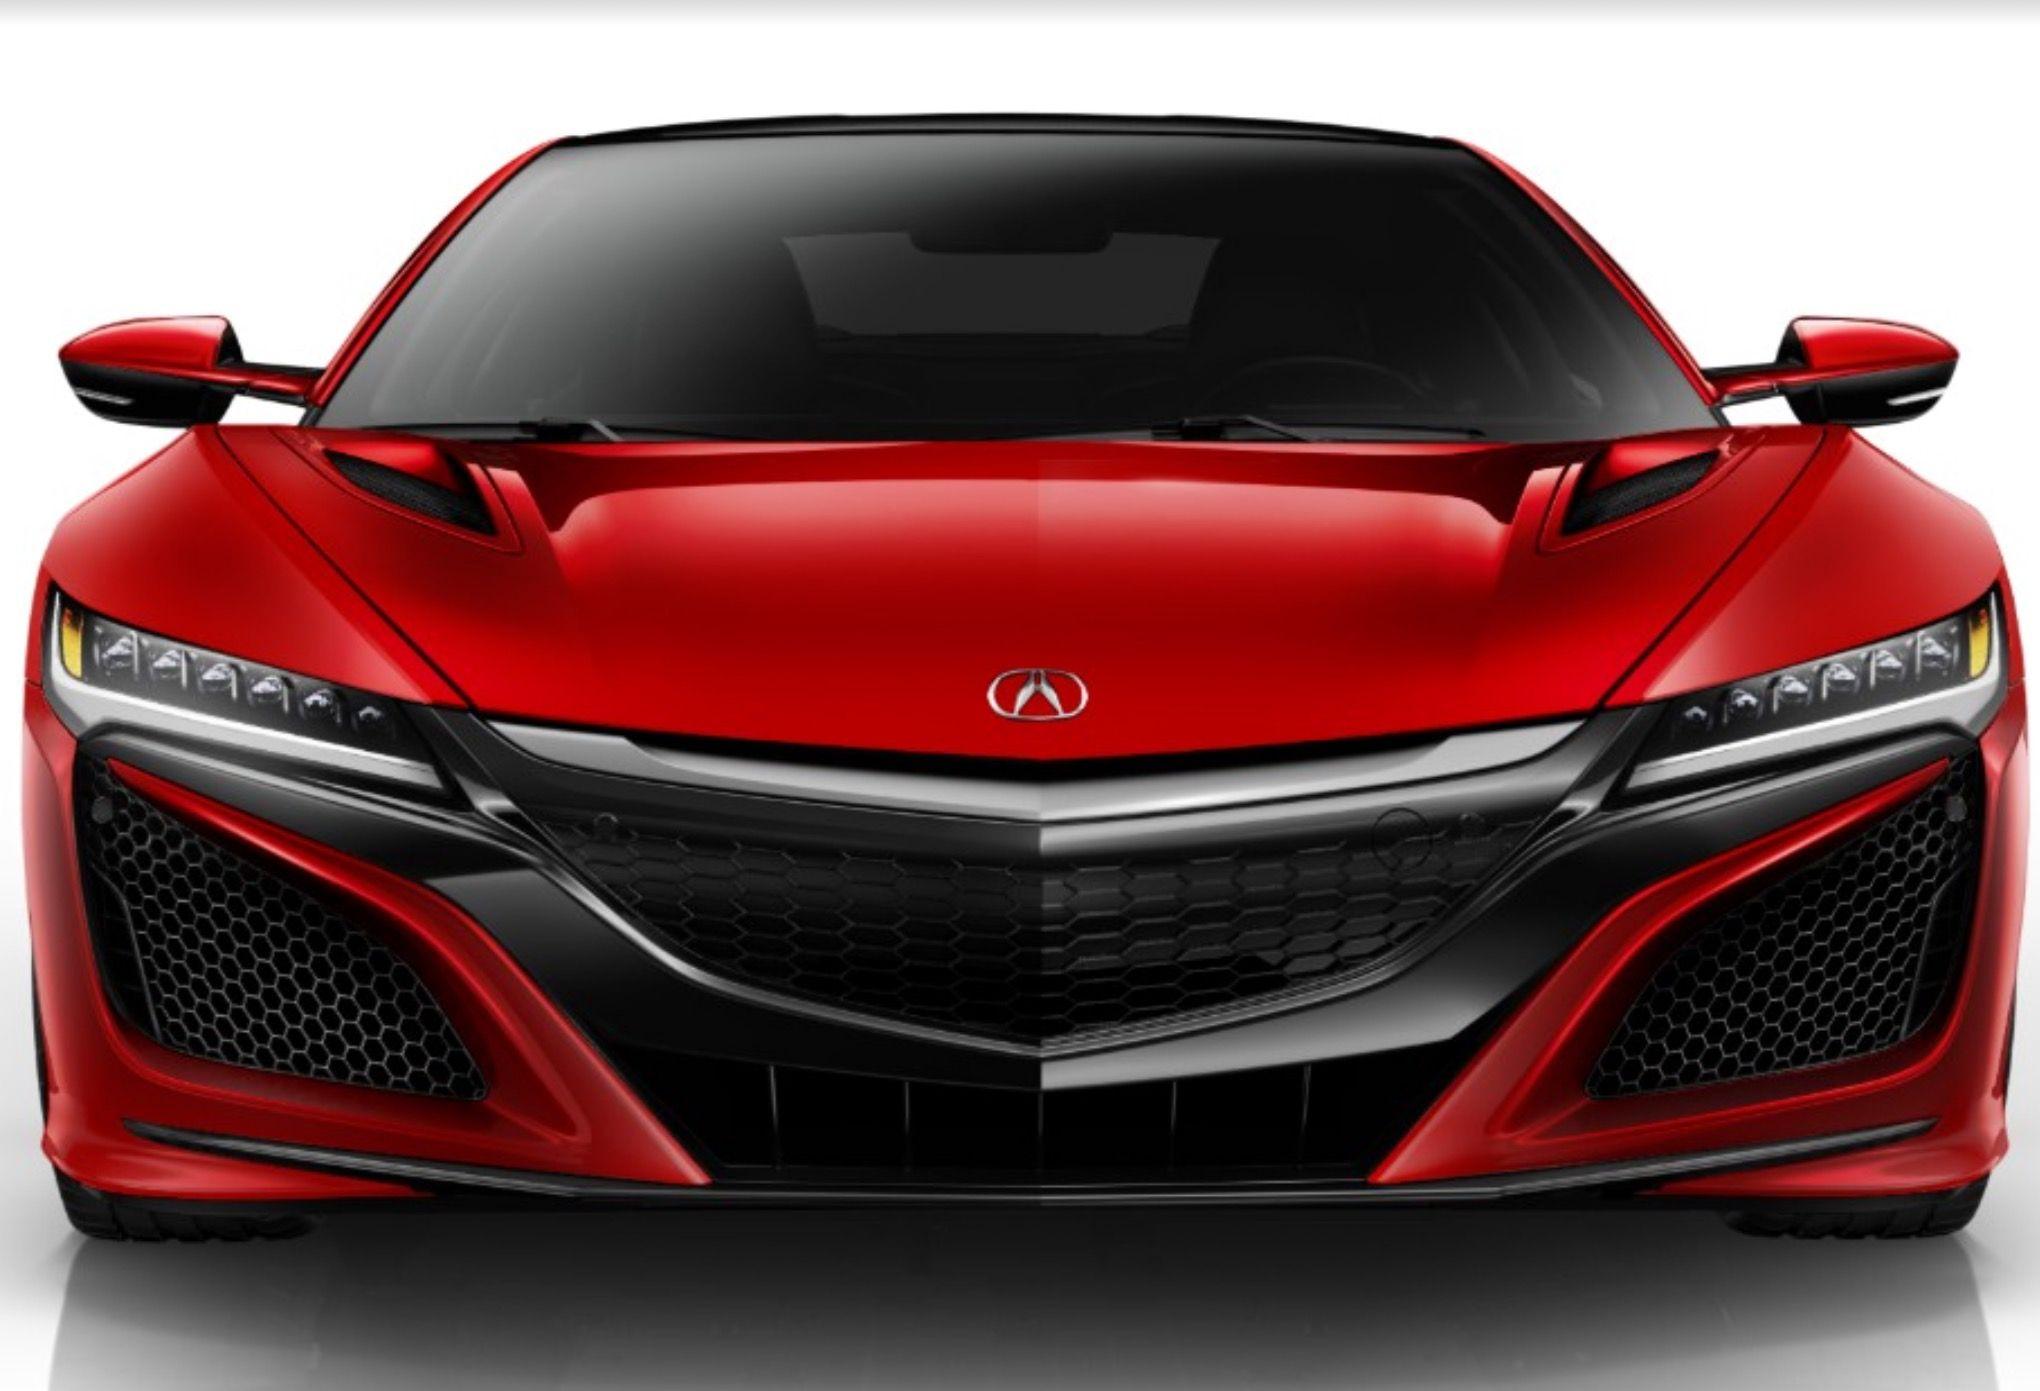 Acura NSX Car name generator, Acura nsx, 2017 acura nsx